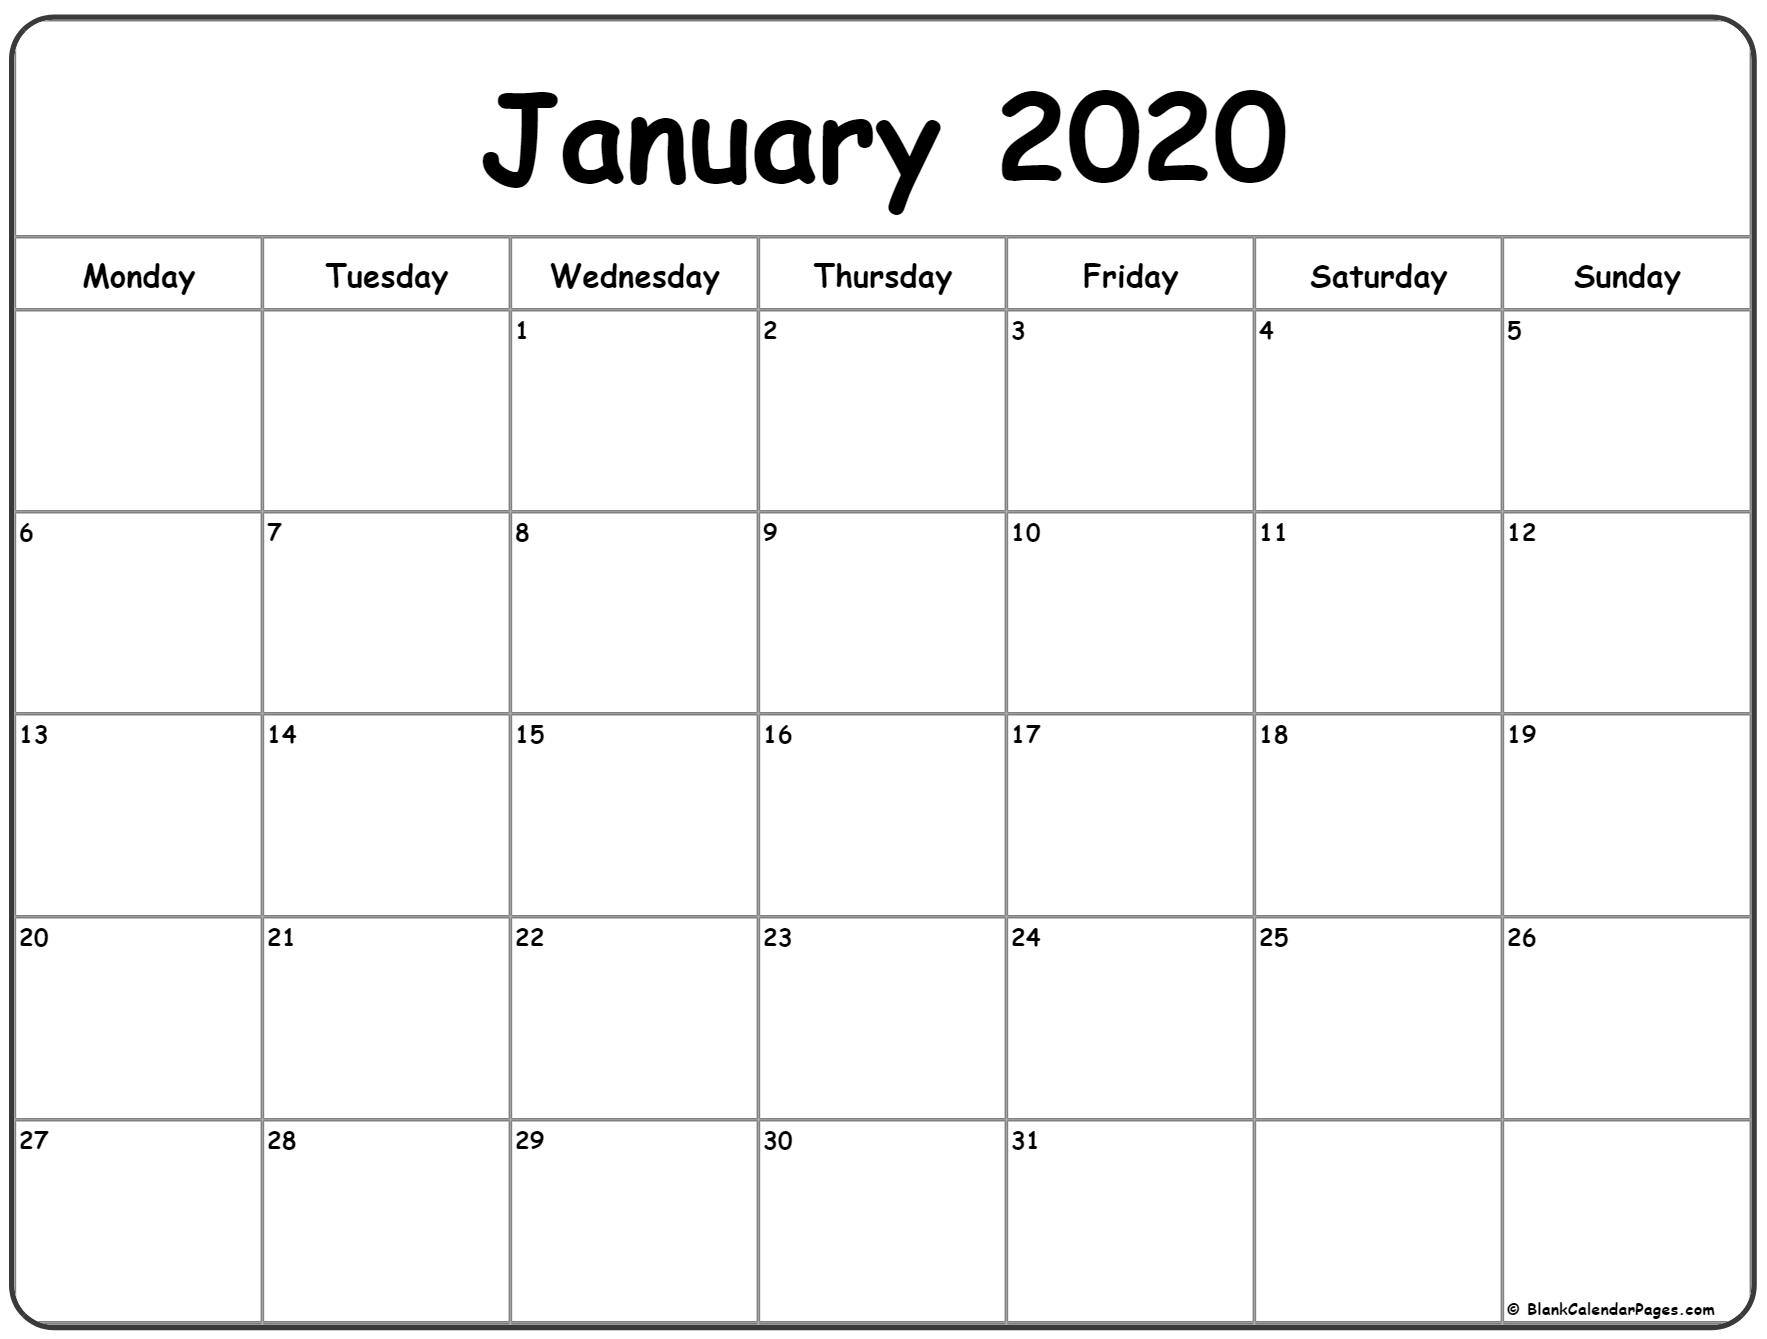 January 2020 Monday Calendar   Monday To Sunday intended for January 2020 Calendar Starting Monday